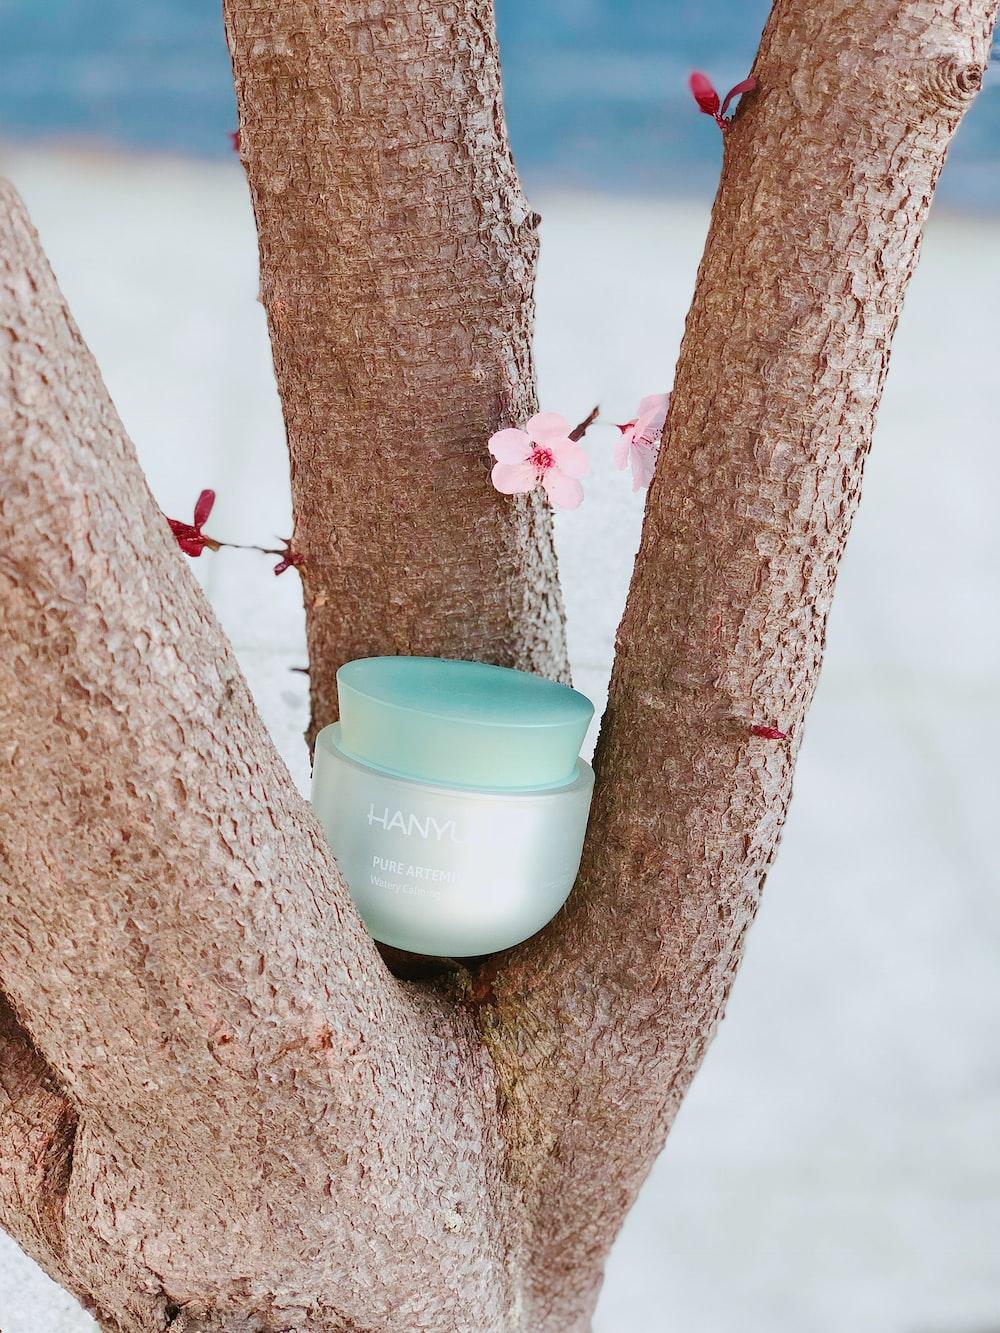 teal tub on tree branch